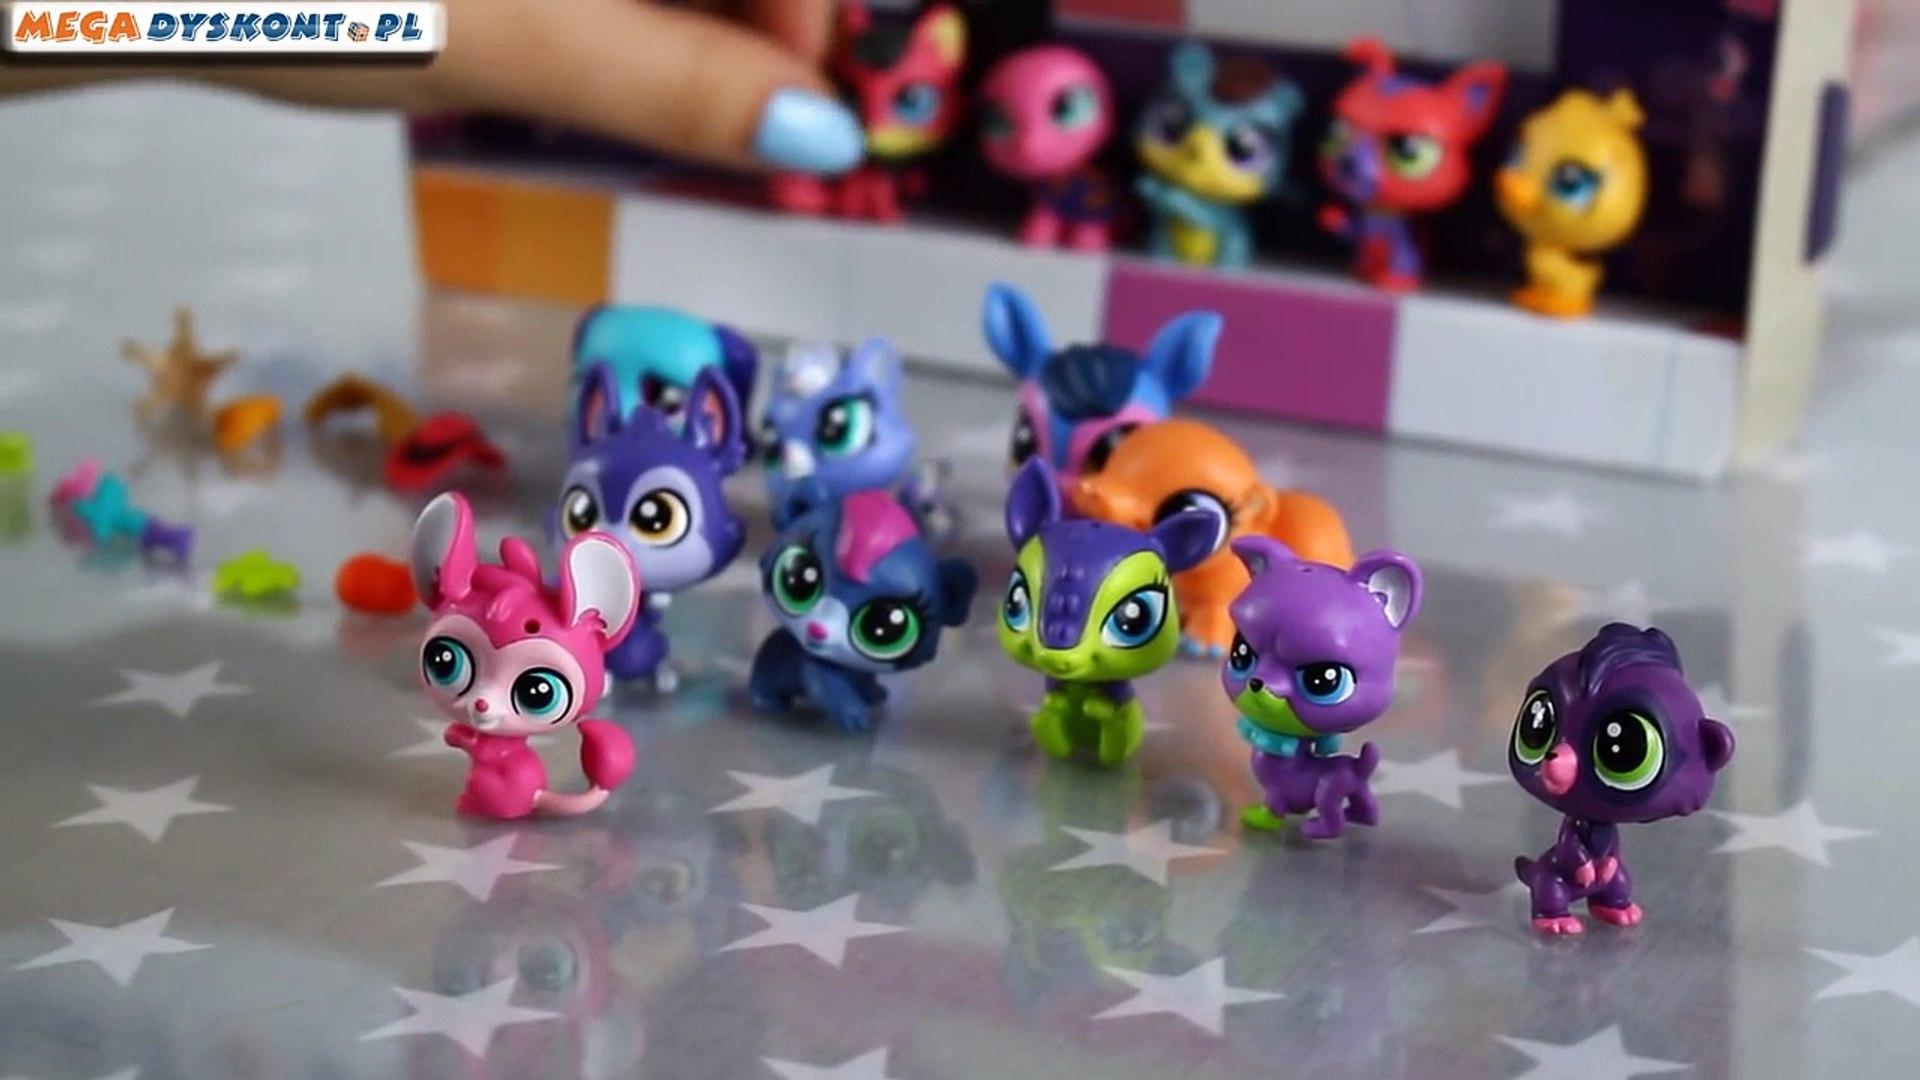 Littlest Pet Shop - Pet Party Spectacular - 15 Pets / 15 Zwierzaków - B3808 - MegaDyskont.pl